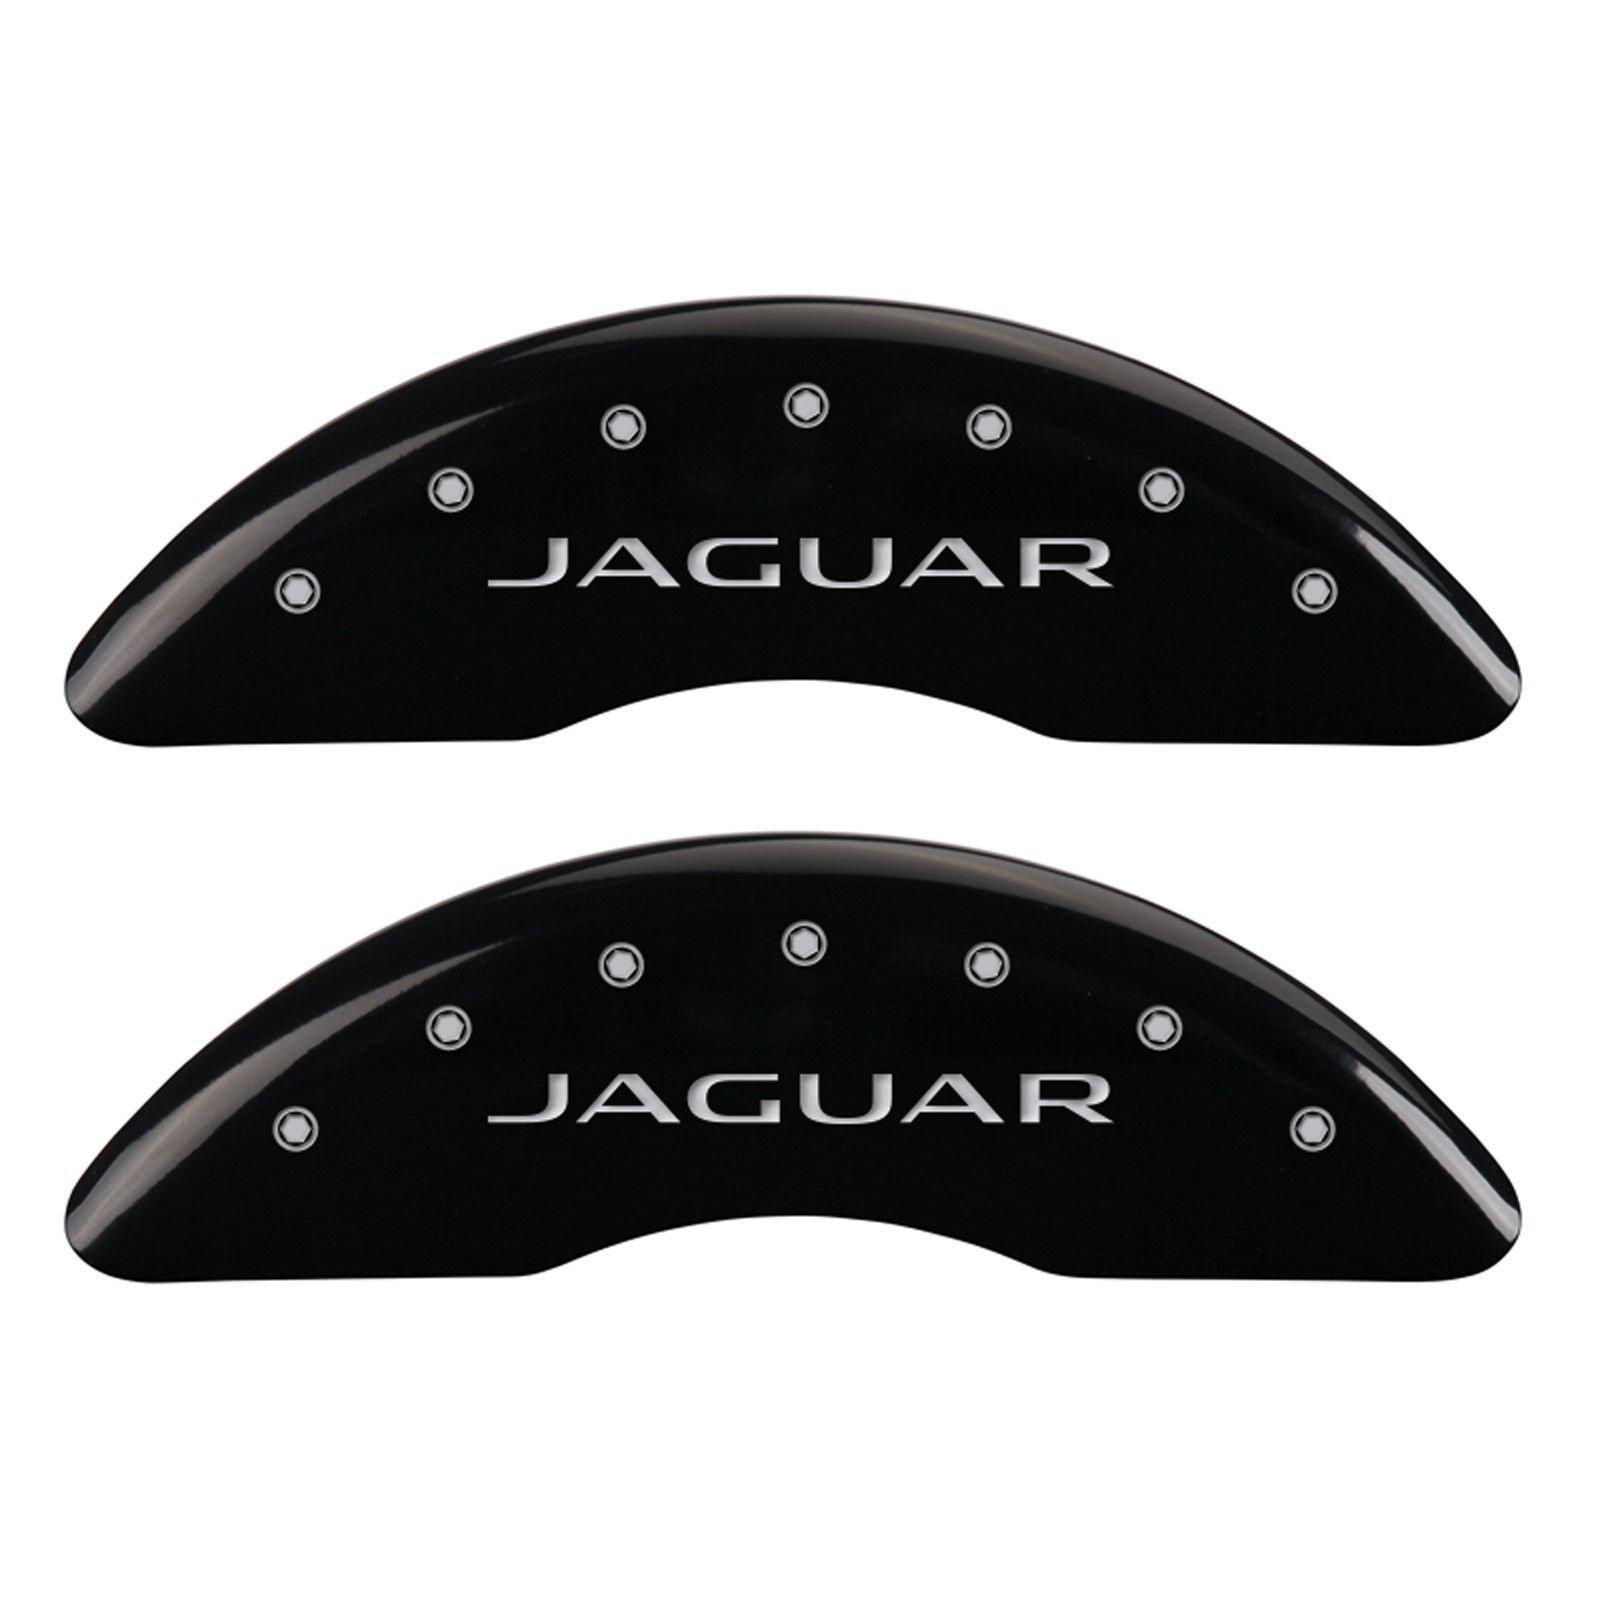 MGP Caliper Covers 41003SJALBK Caliper Cover (Black Powder Coat Finish, Engraved Front: Jaguar - Engraved Rear: Leaper/2012, Silver Characters, Set of 4)